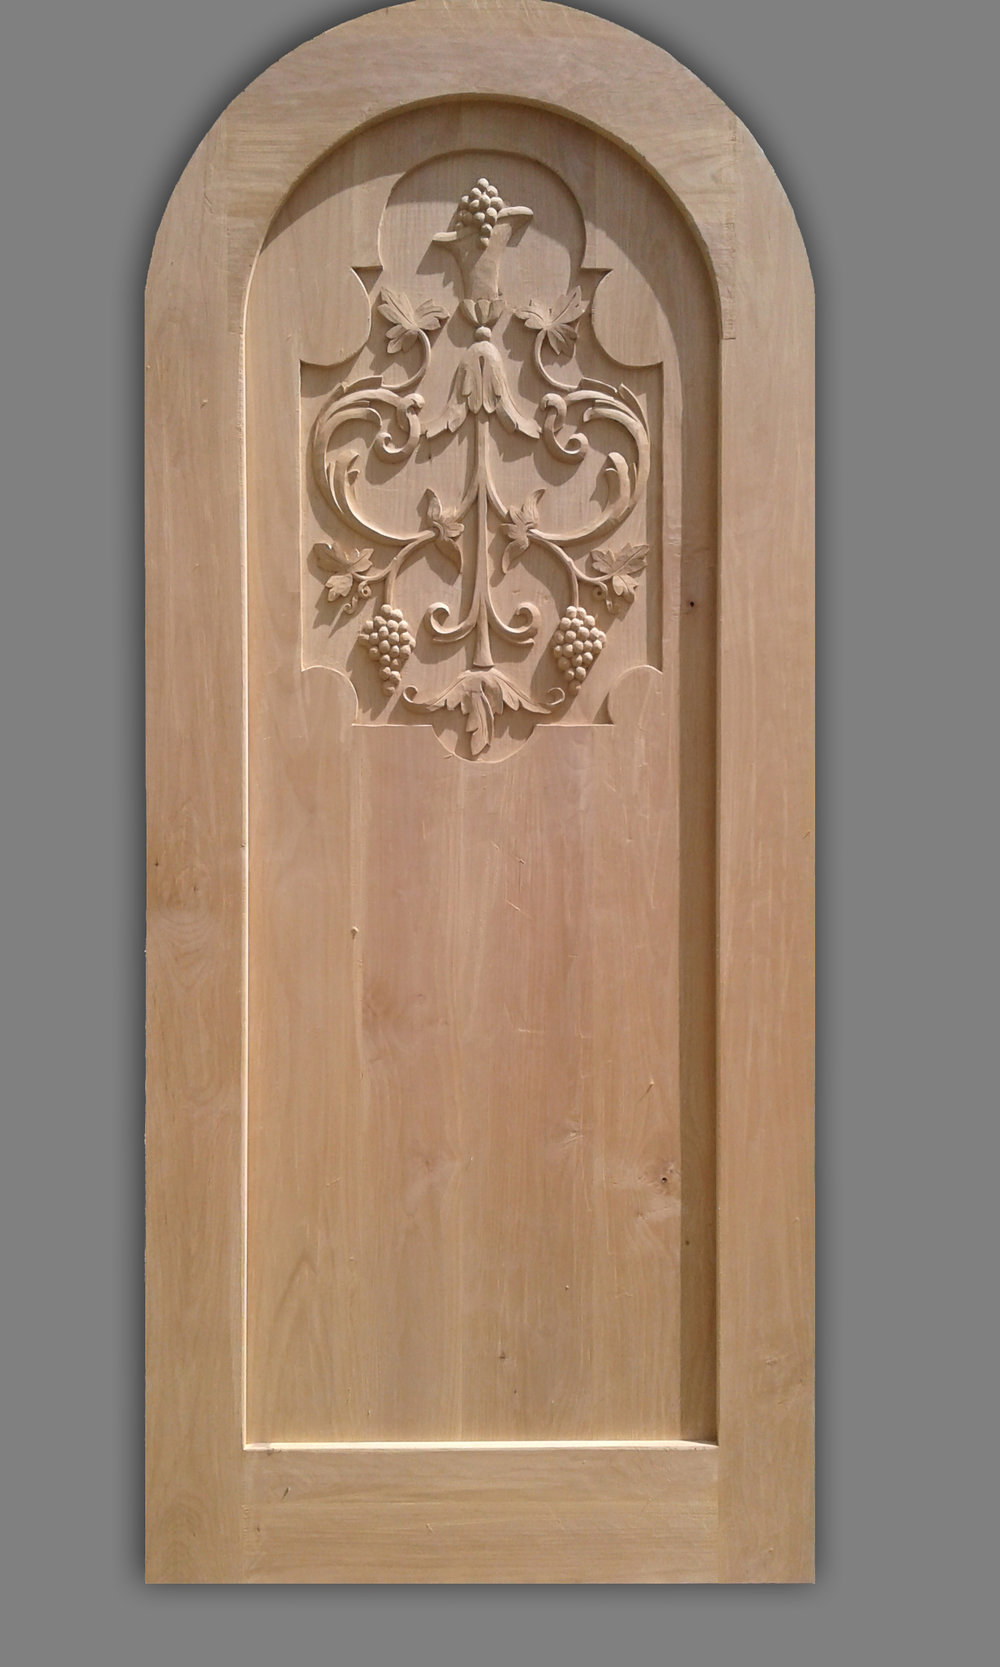 Roma, carved wood wine cellar door.